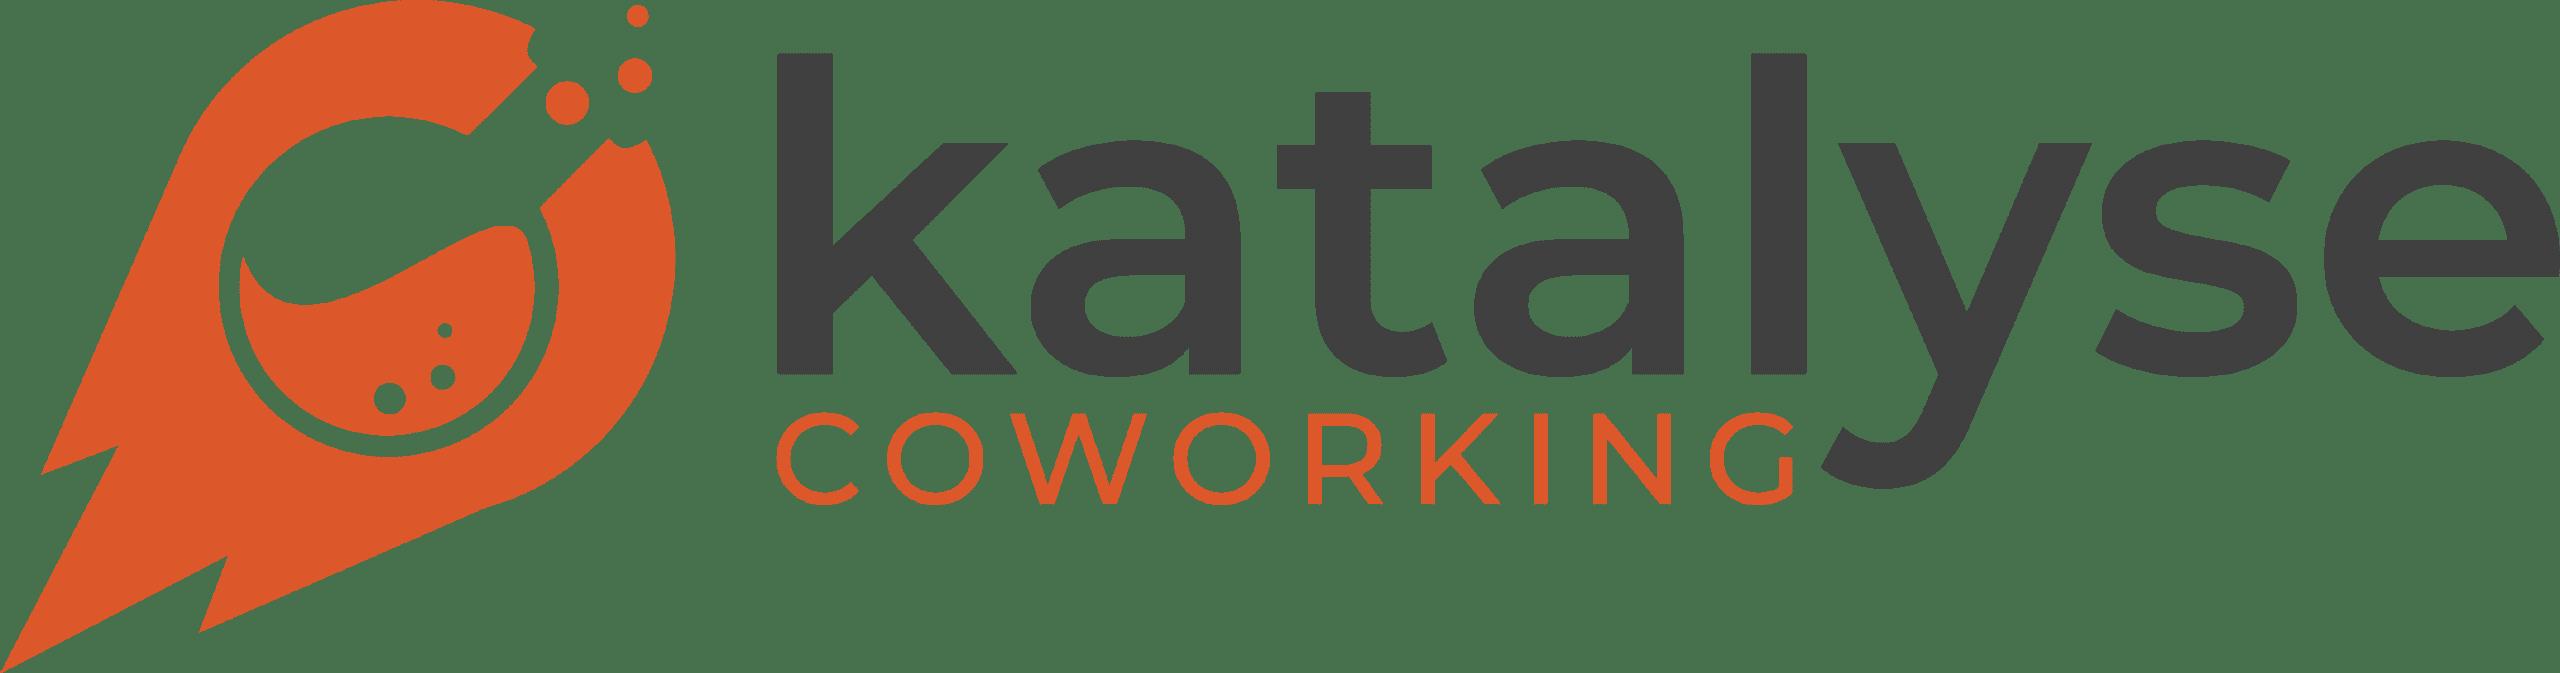 Katalyse-coworking